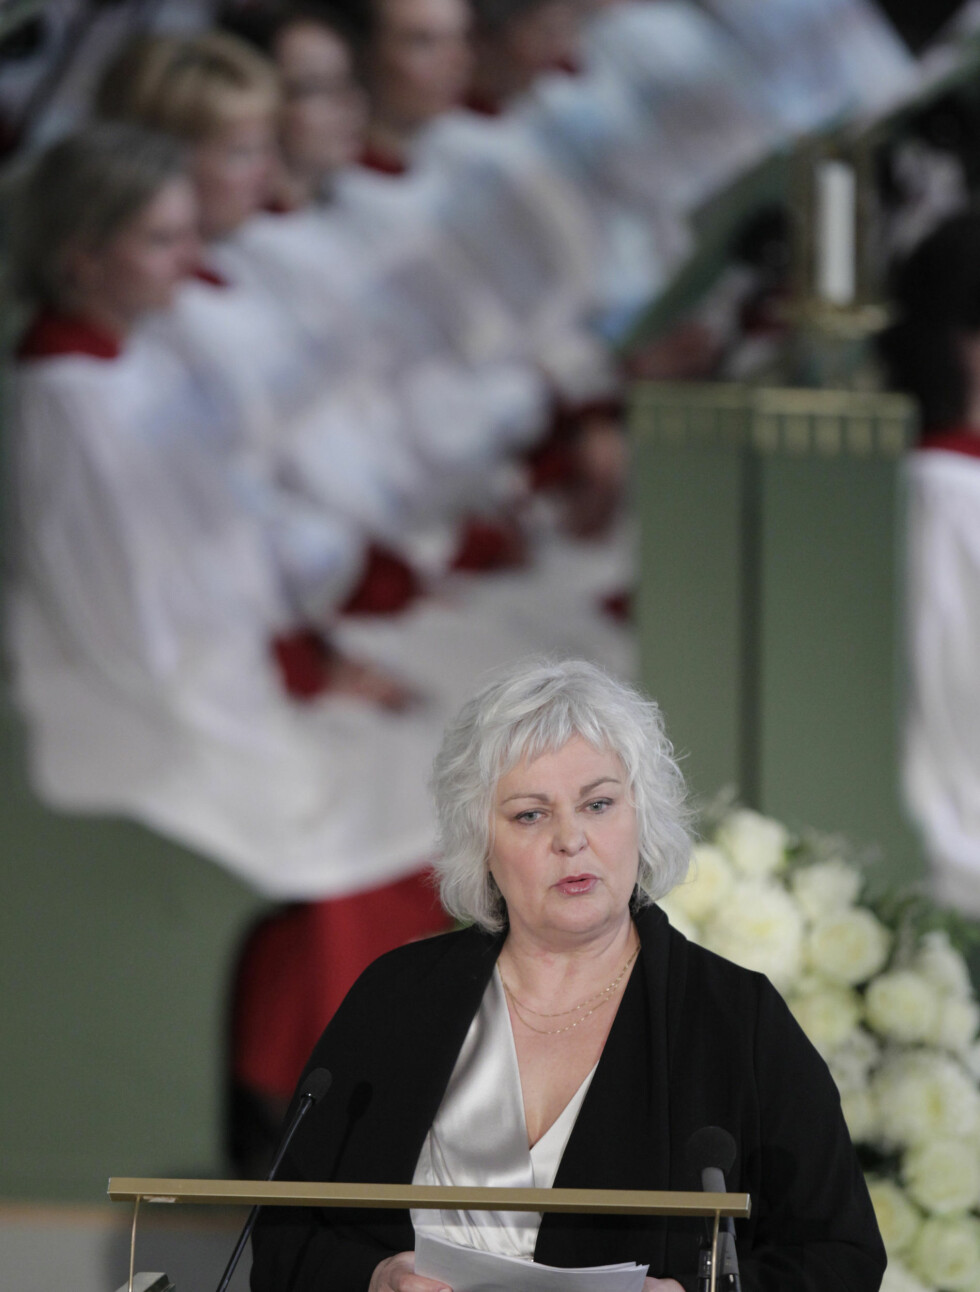 <strong>MINNEORD FRA TEATERET:</strong> Ellen Horn snakket om Wenche Foss sitt bidrag på Nationaltheatret i sin minnetale. Foto: Scanpix